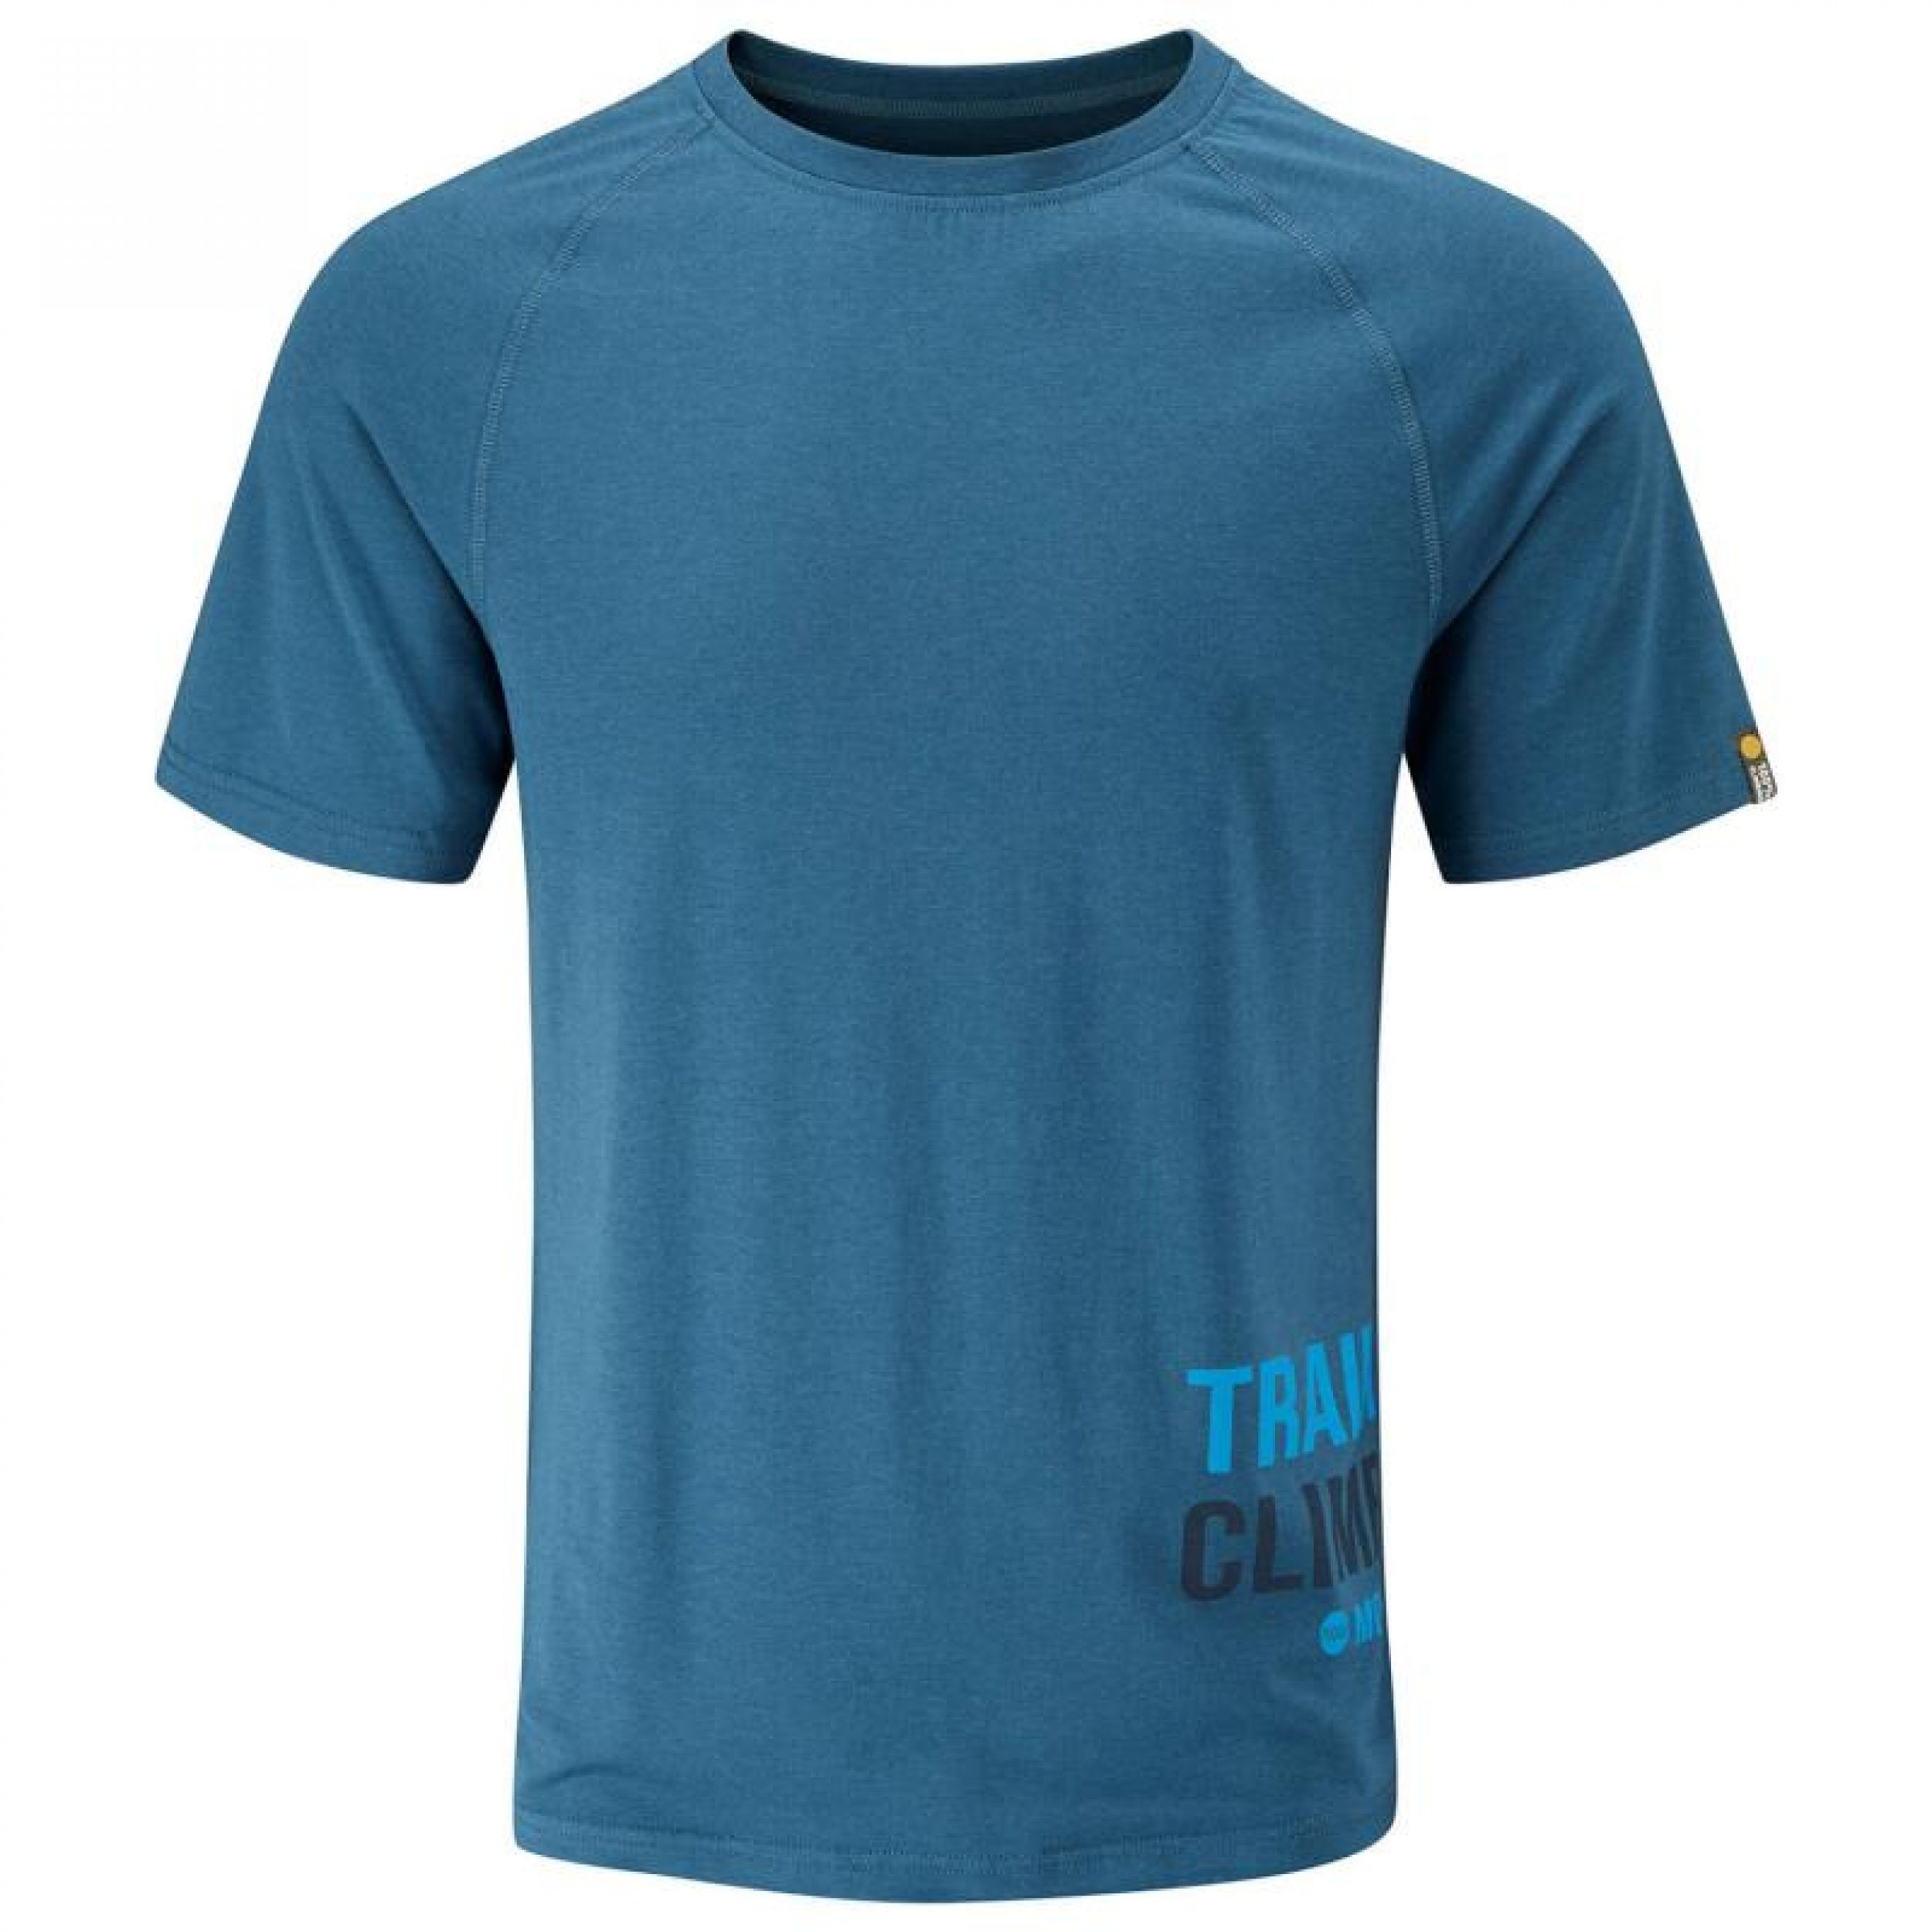 moon-climbing-train-hard-tech-tee-t-shirt.jpg